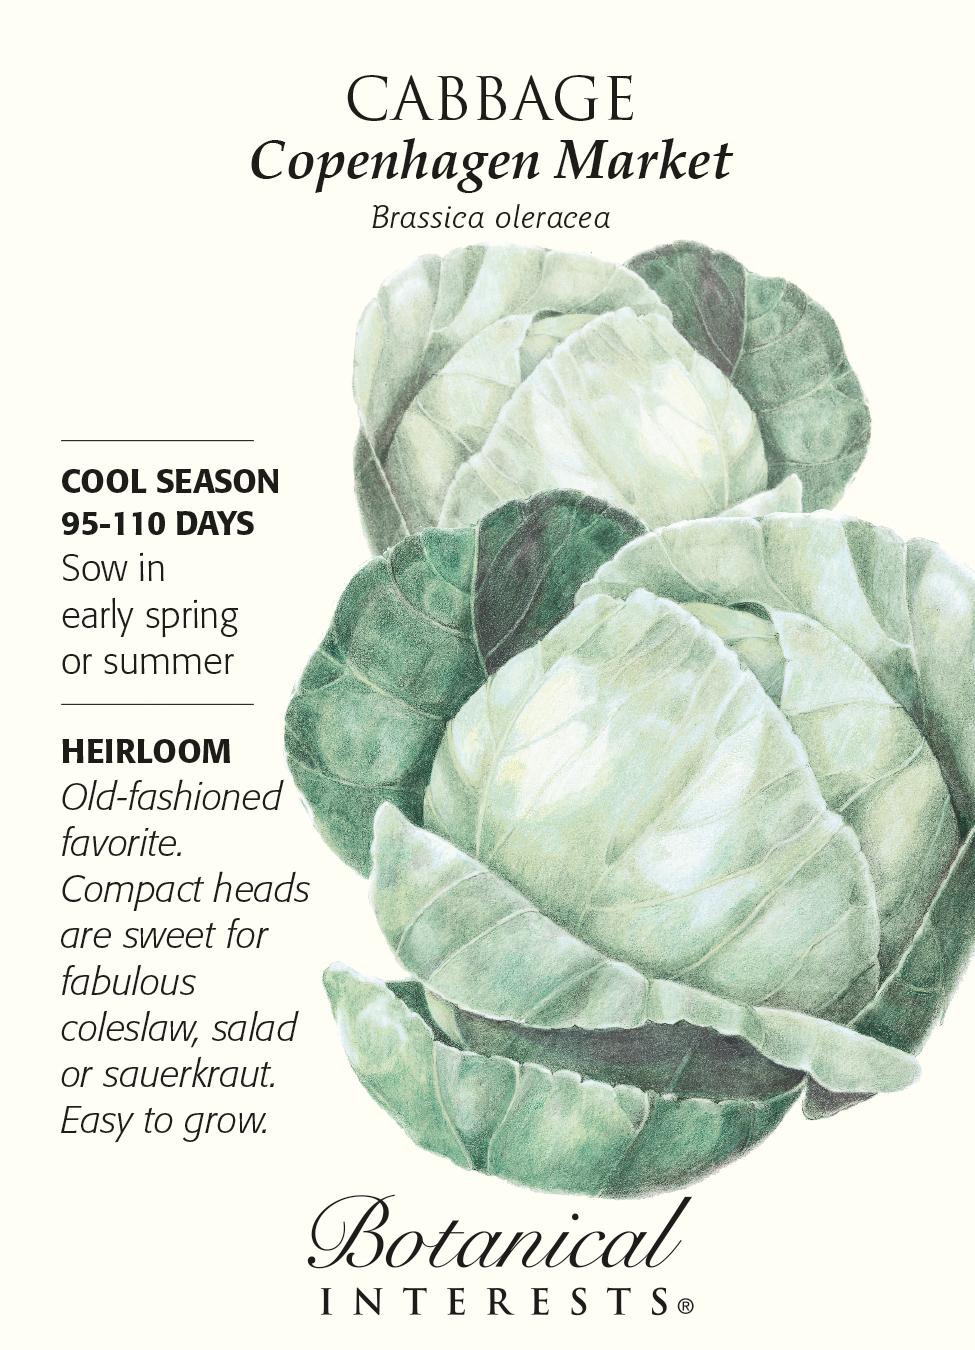 NEW!500 seed Cabbage Copenhagen กะหล่ำปลี Thailand rare